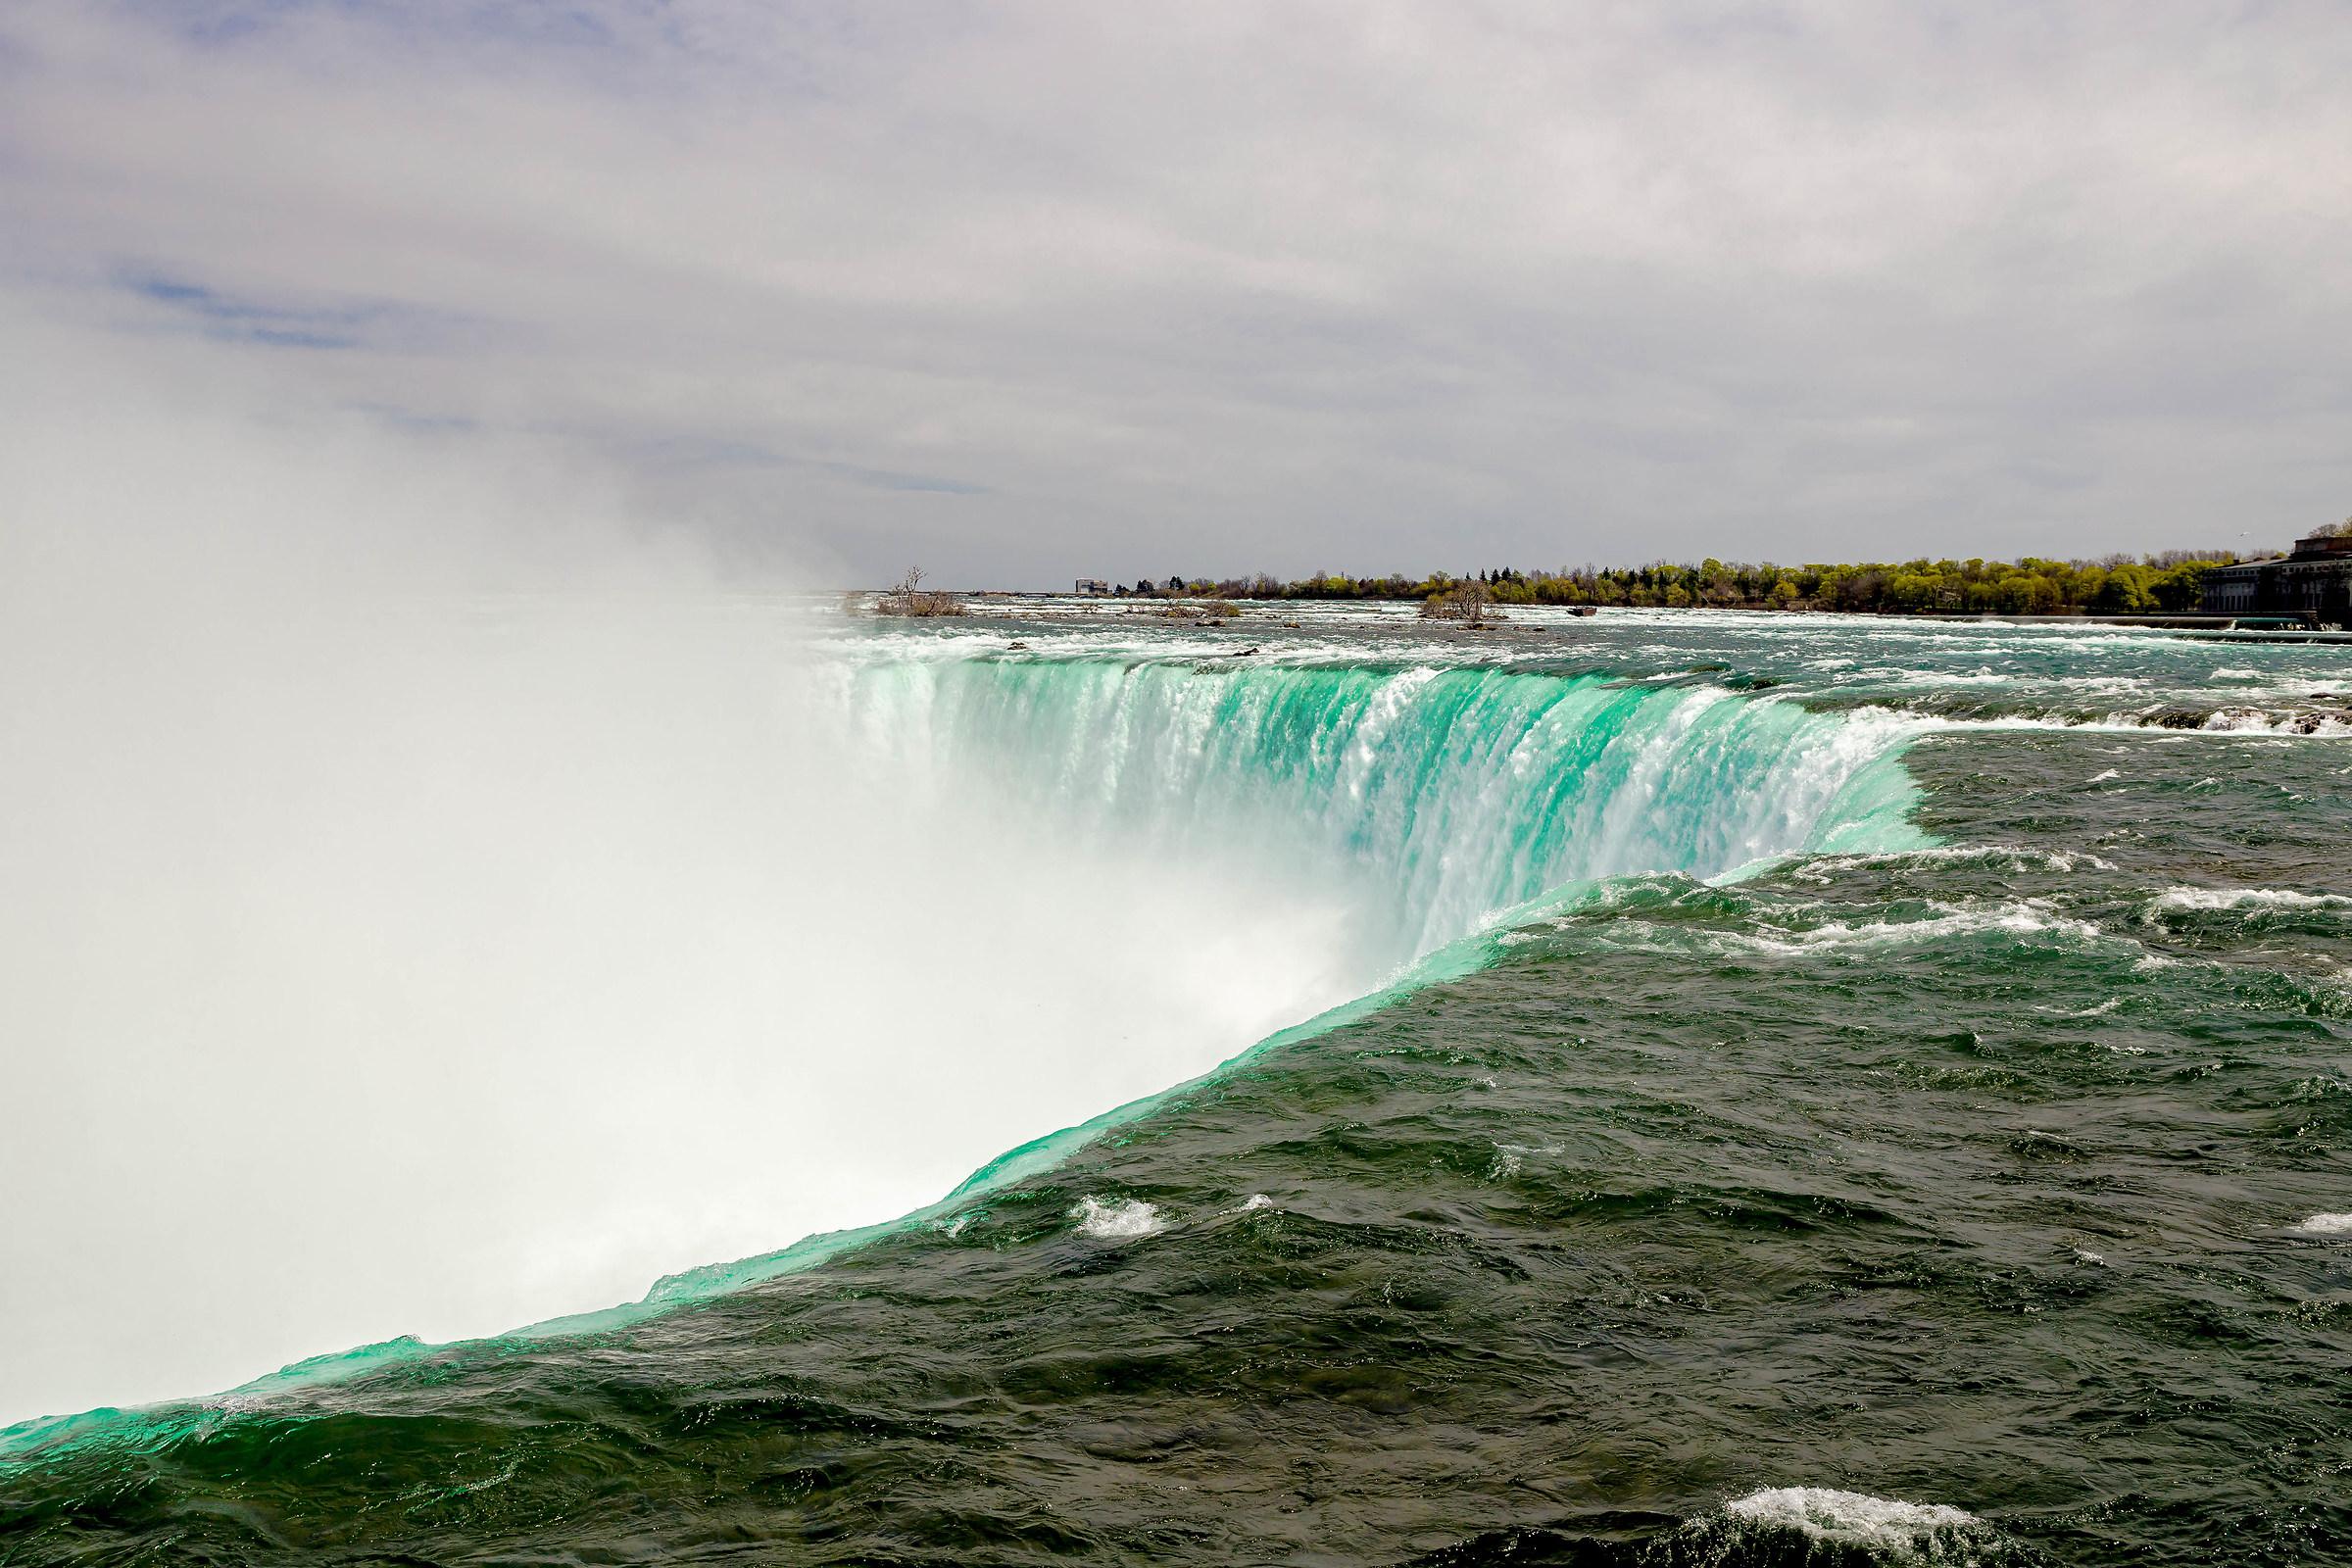 Niagara falls, canadian side...